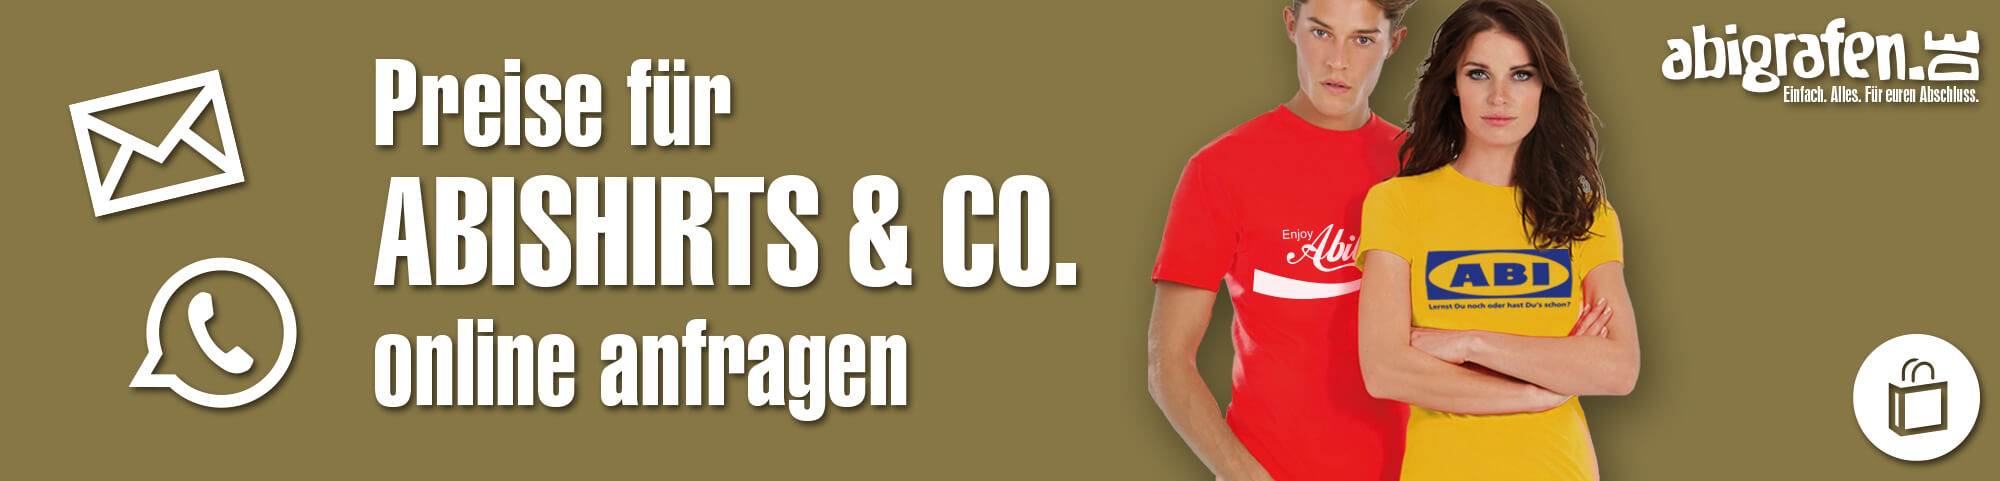 abigrafen-abishop-abshirts-hoodies-tanktops-bedrucken